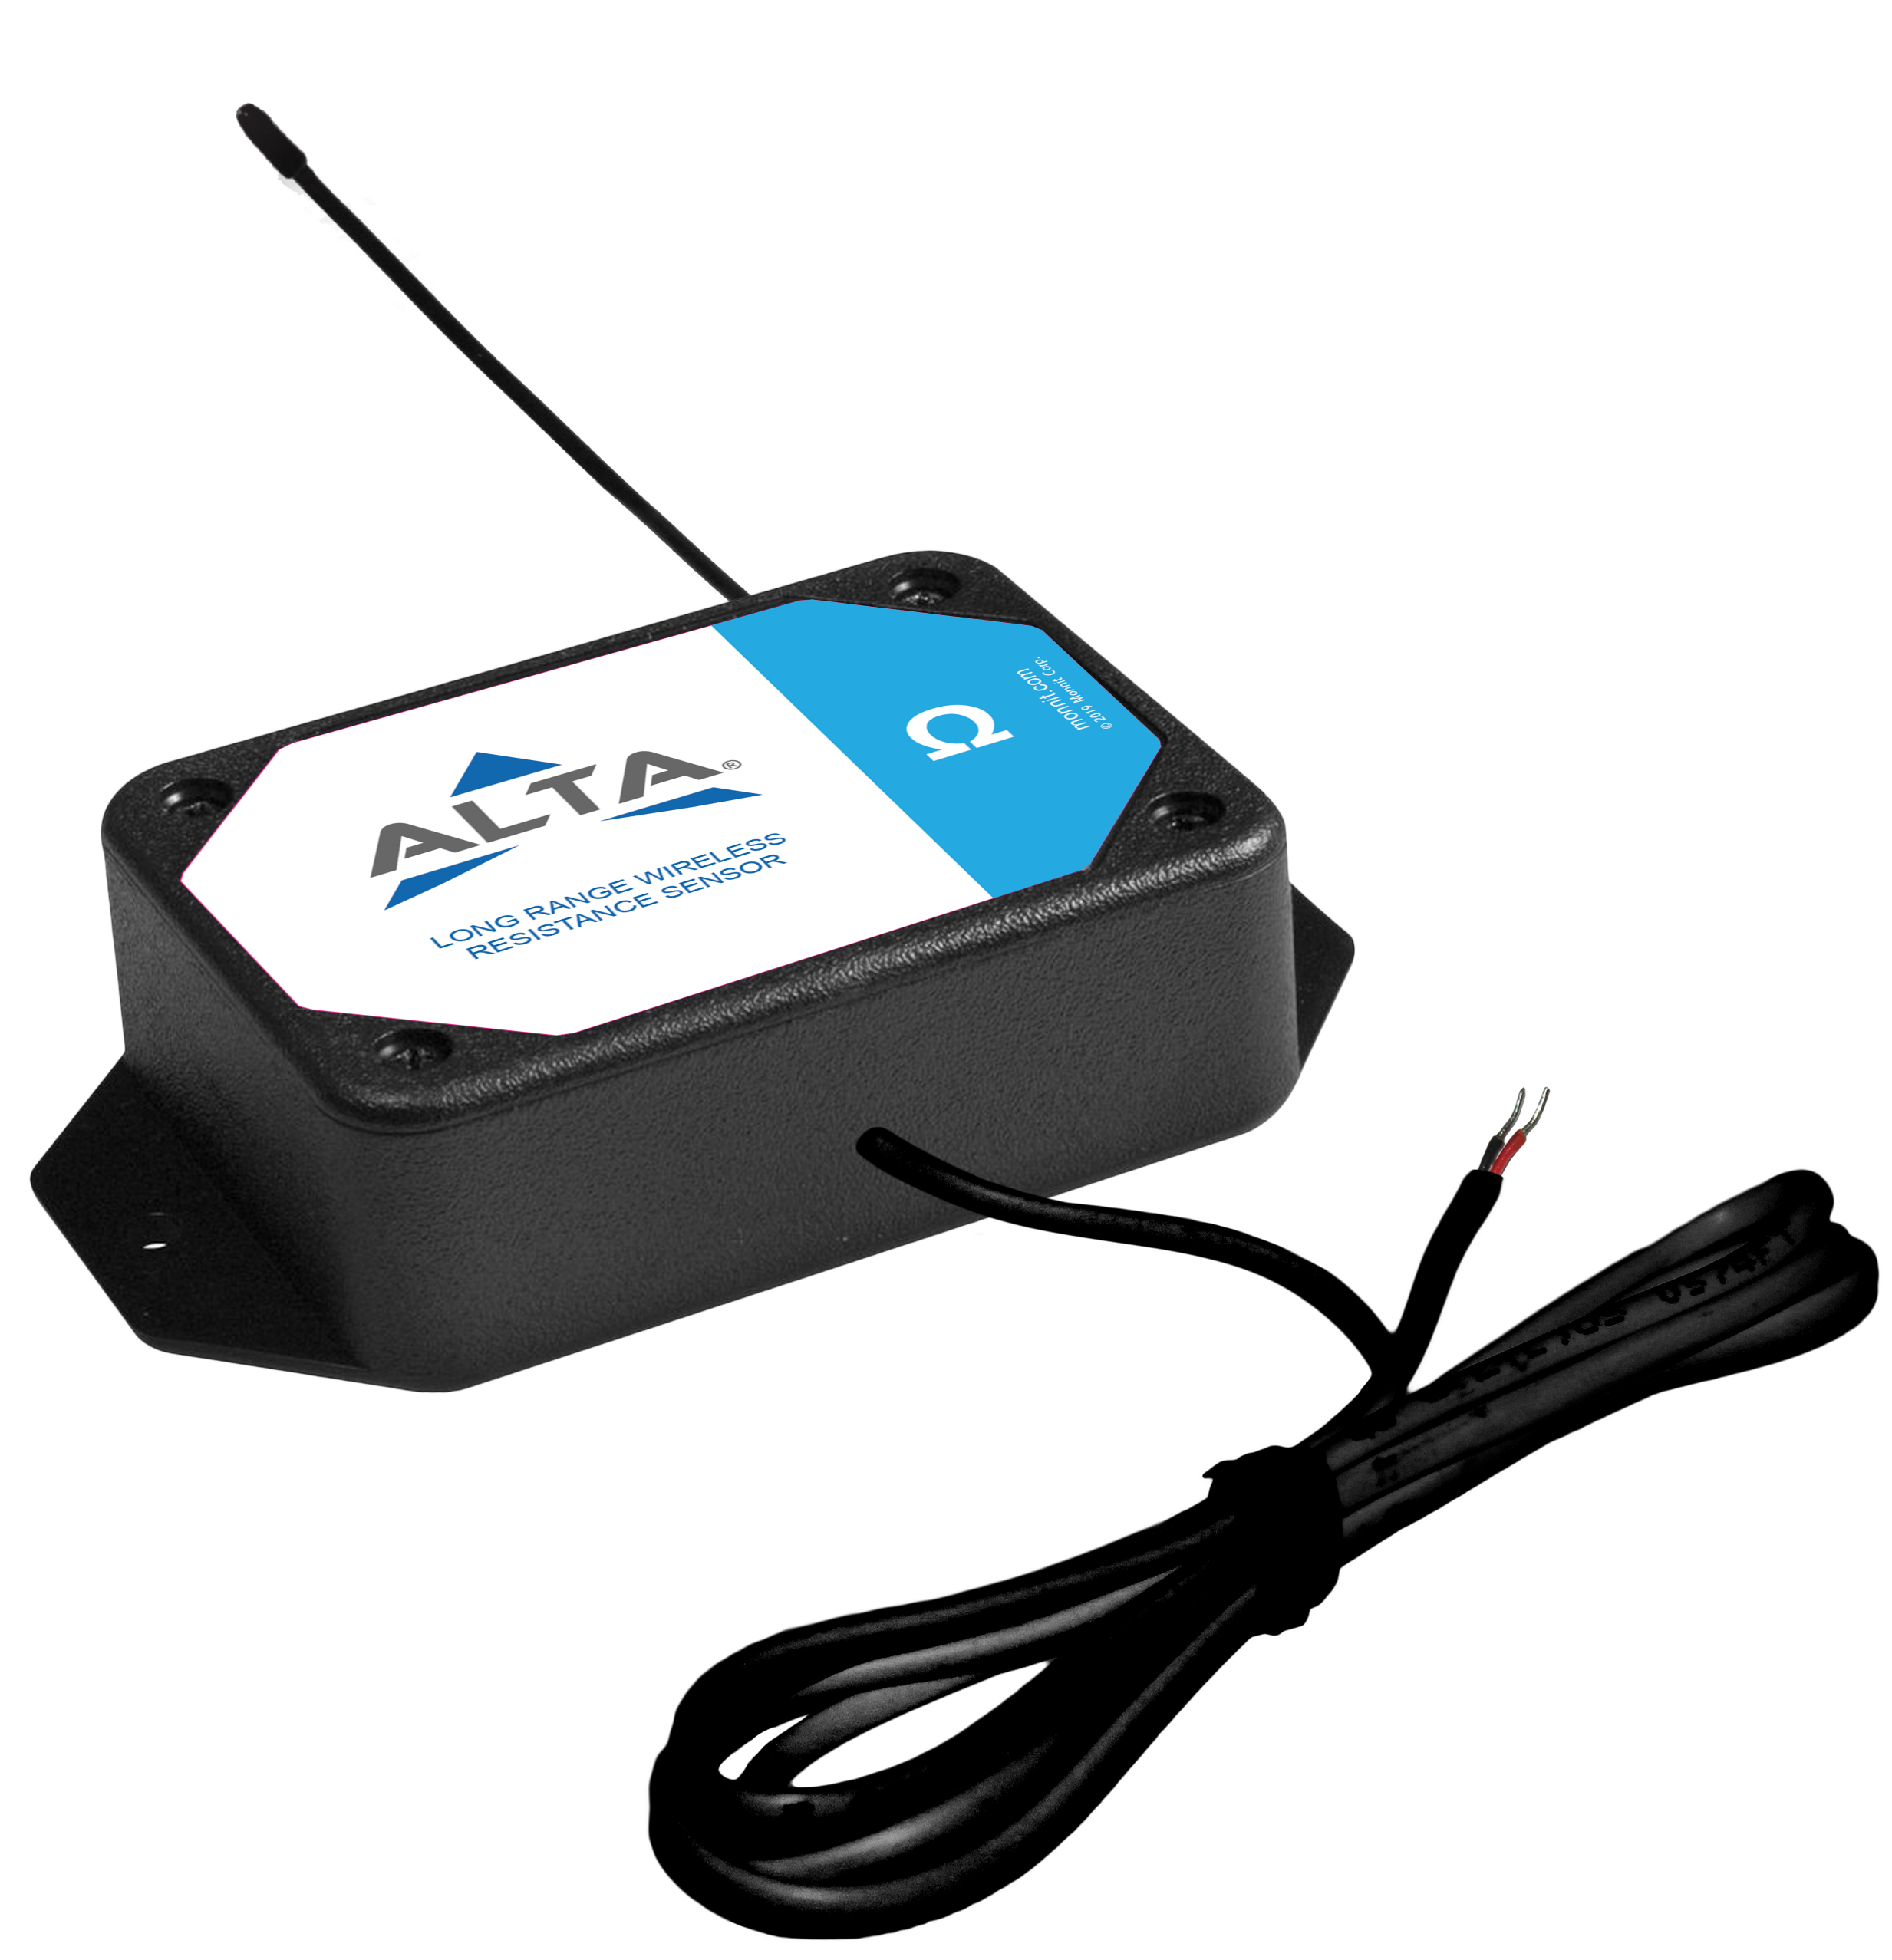 ALTA AA Resistance Sensor